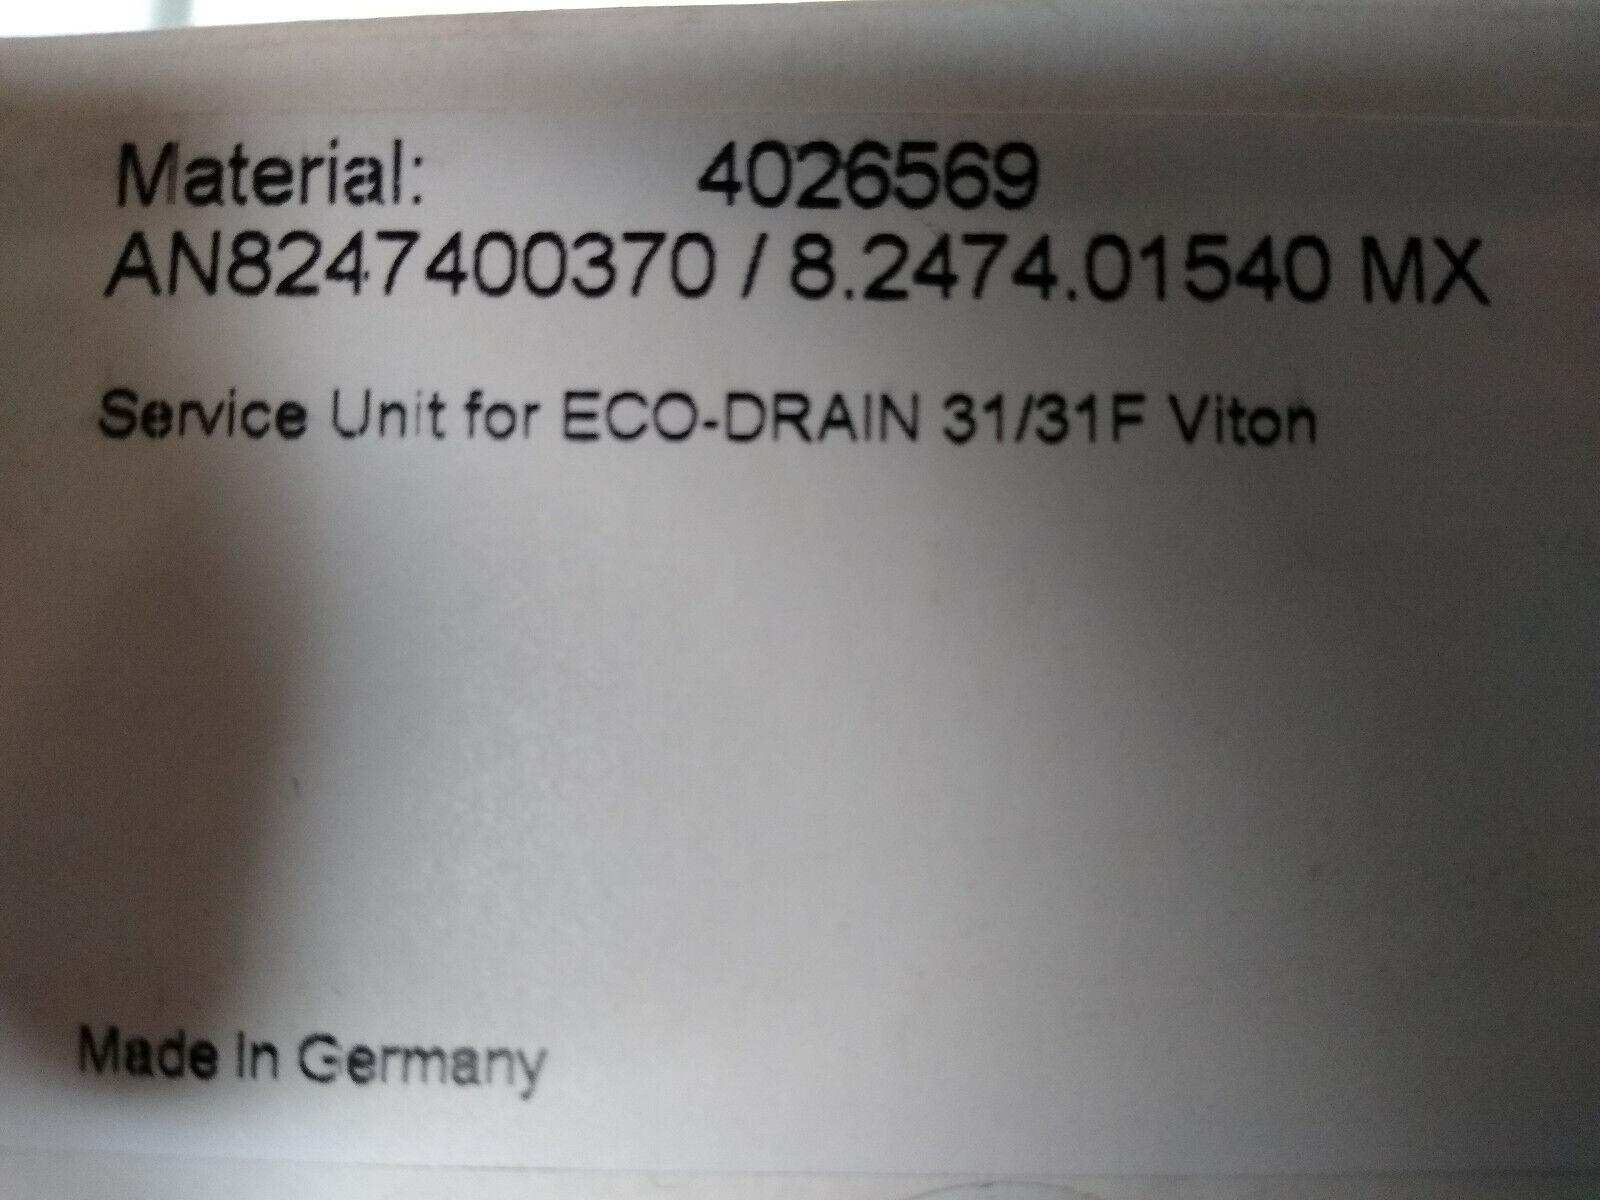 Kaeser service-Unit Eco-Drain 31//31f